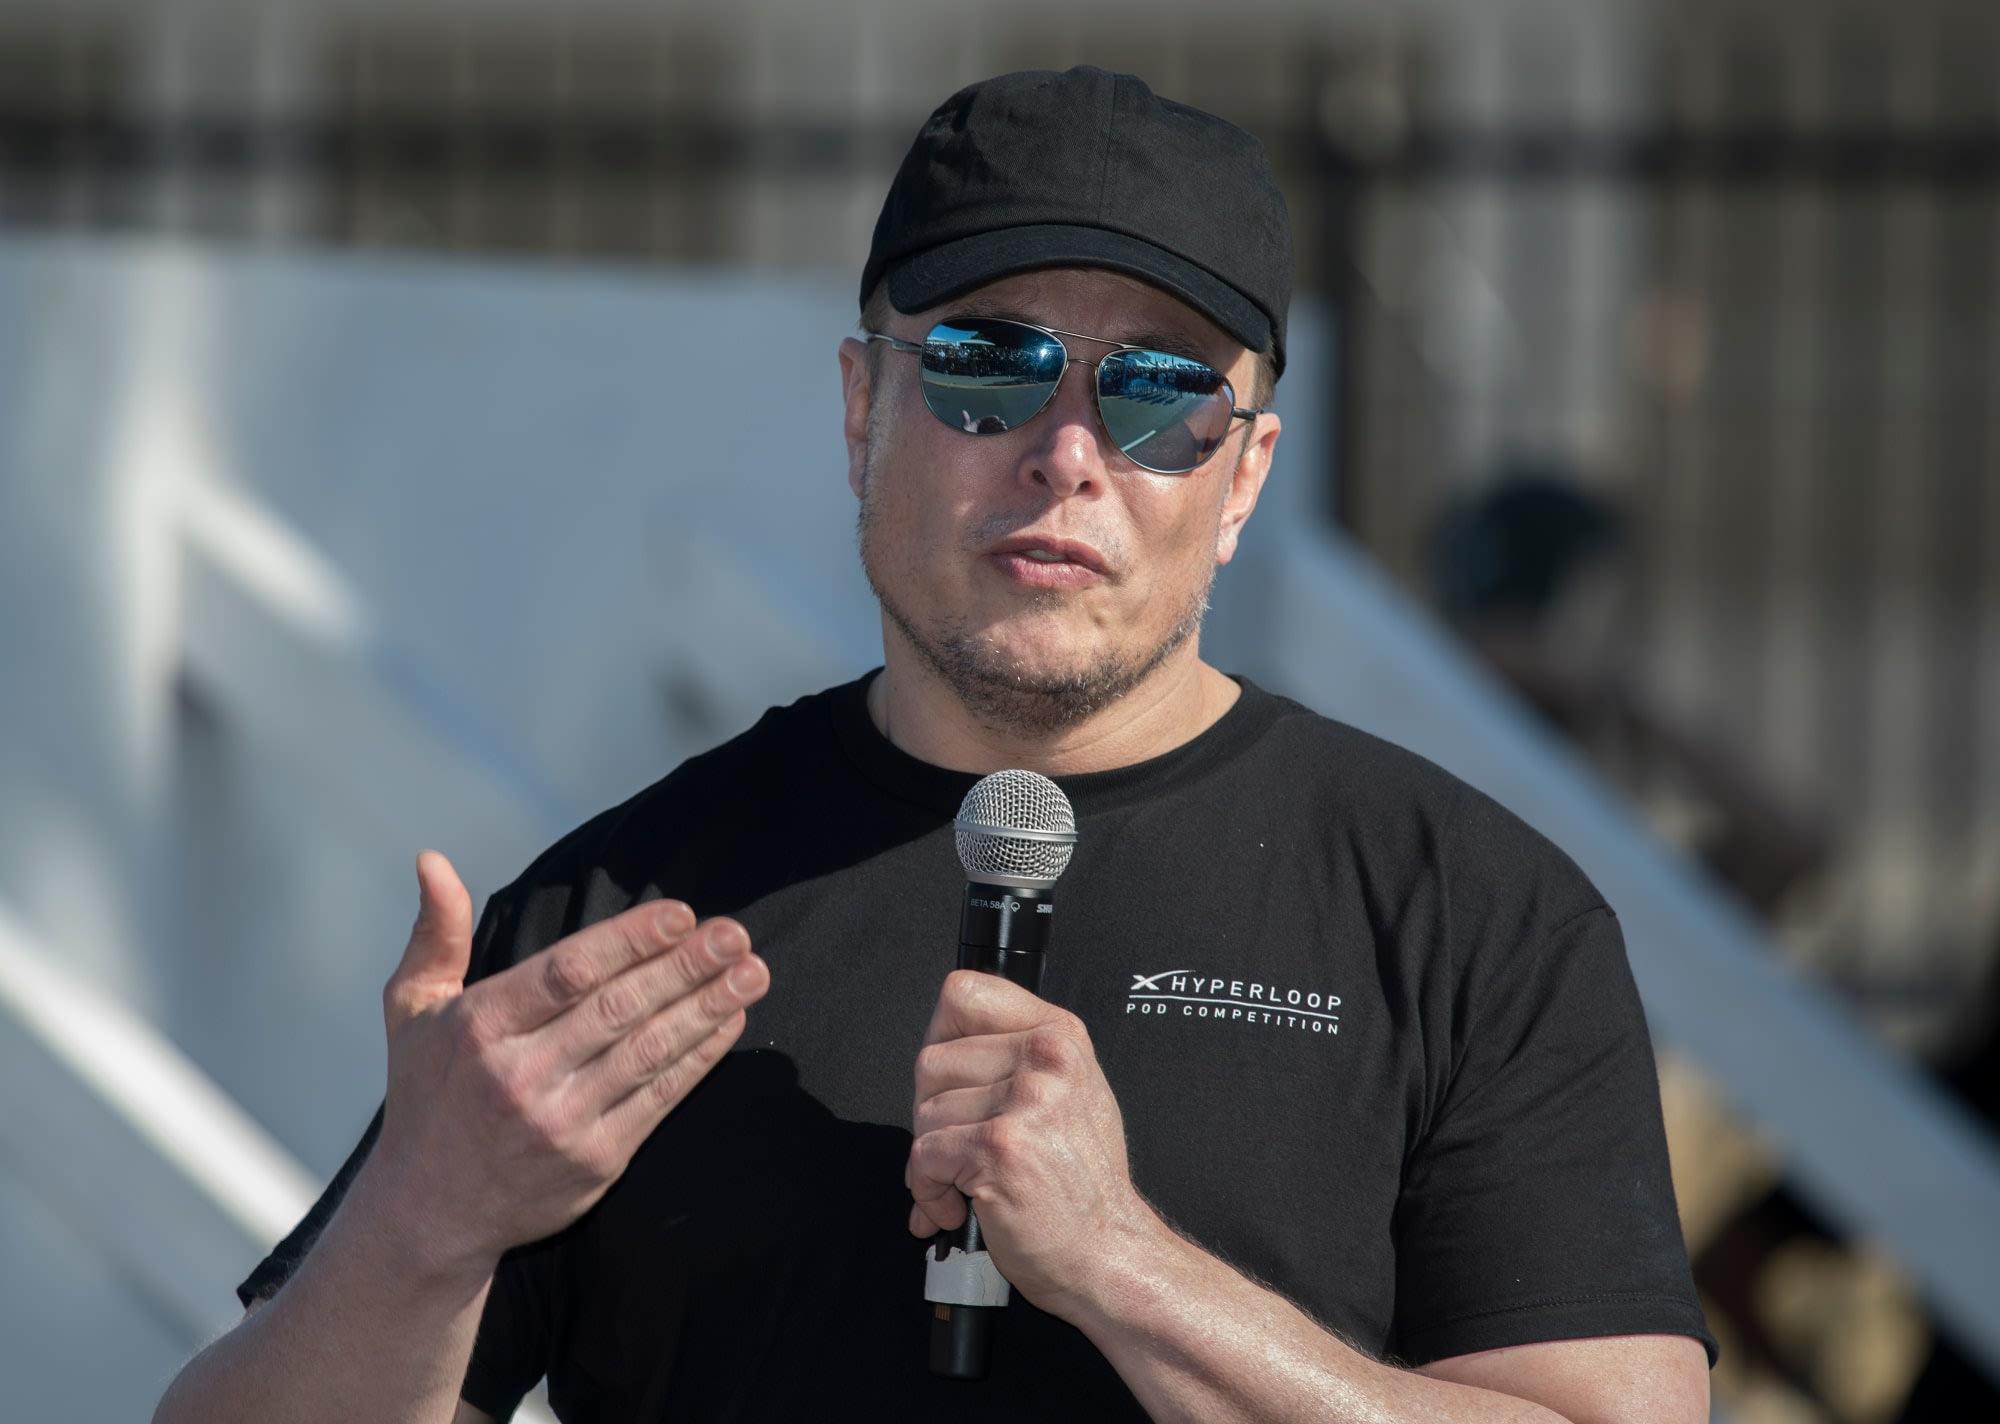 Elon Musk insists 'pedo guy' tweet wasn't serious accusation